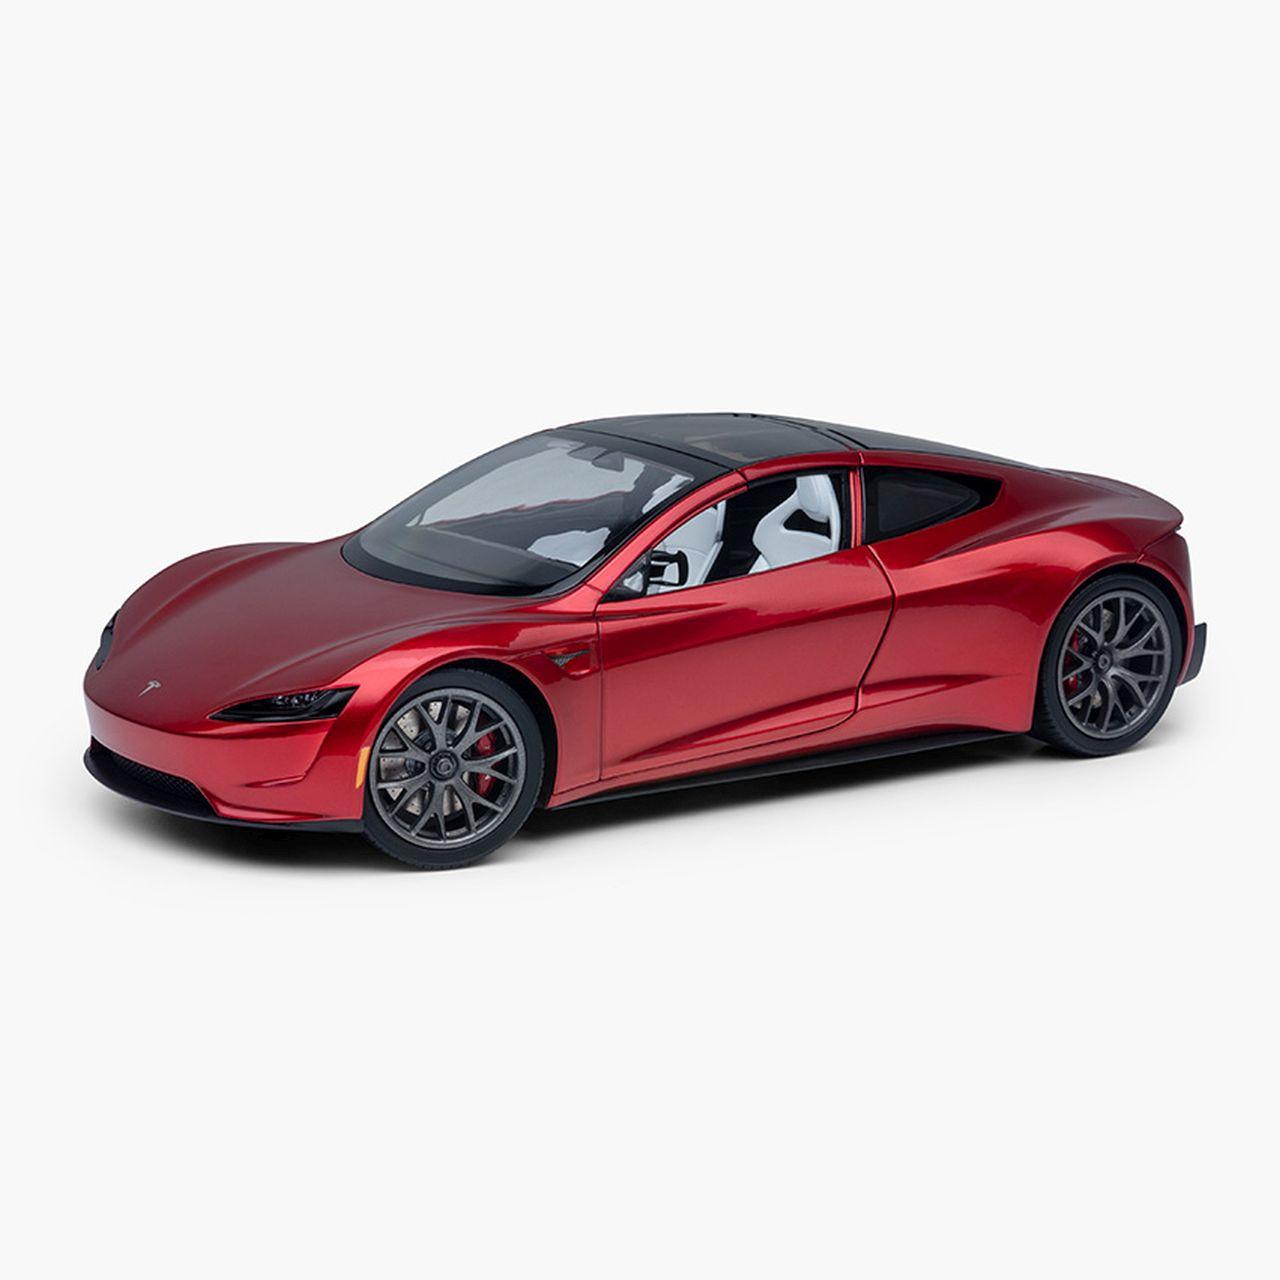 tesla-roadster-red-schaalmodel-001.jpg